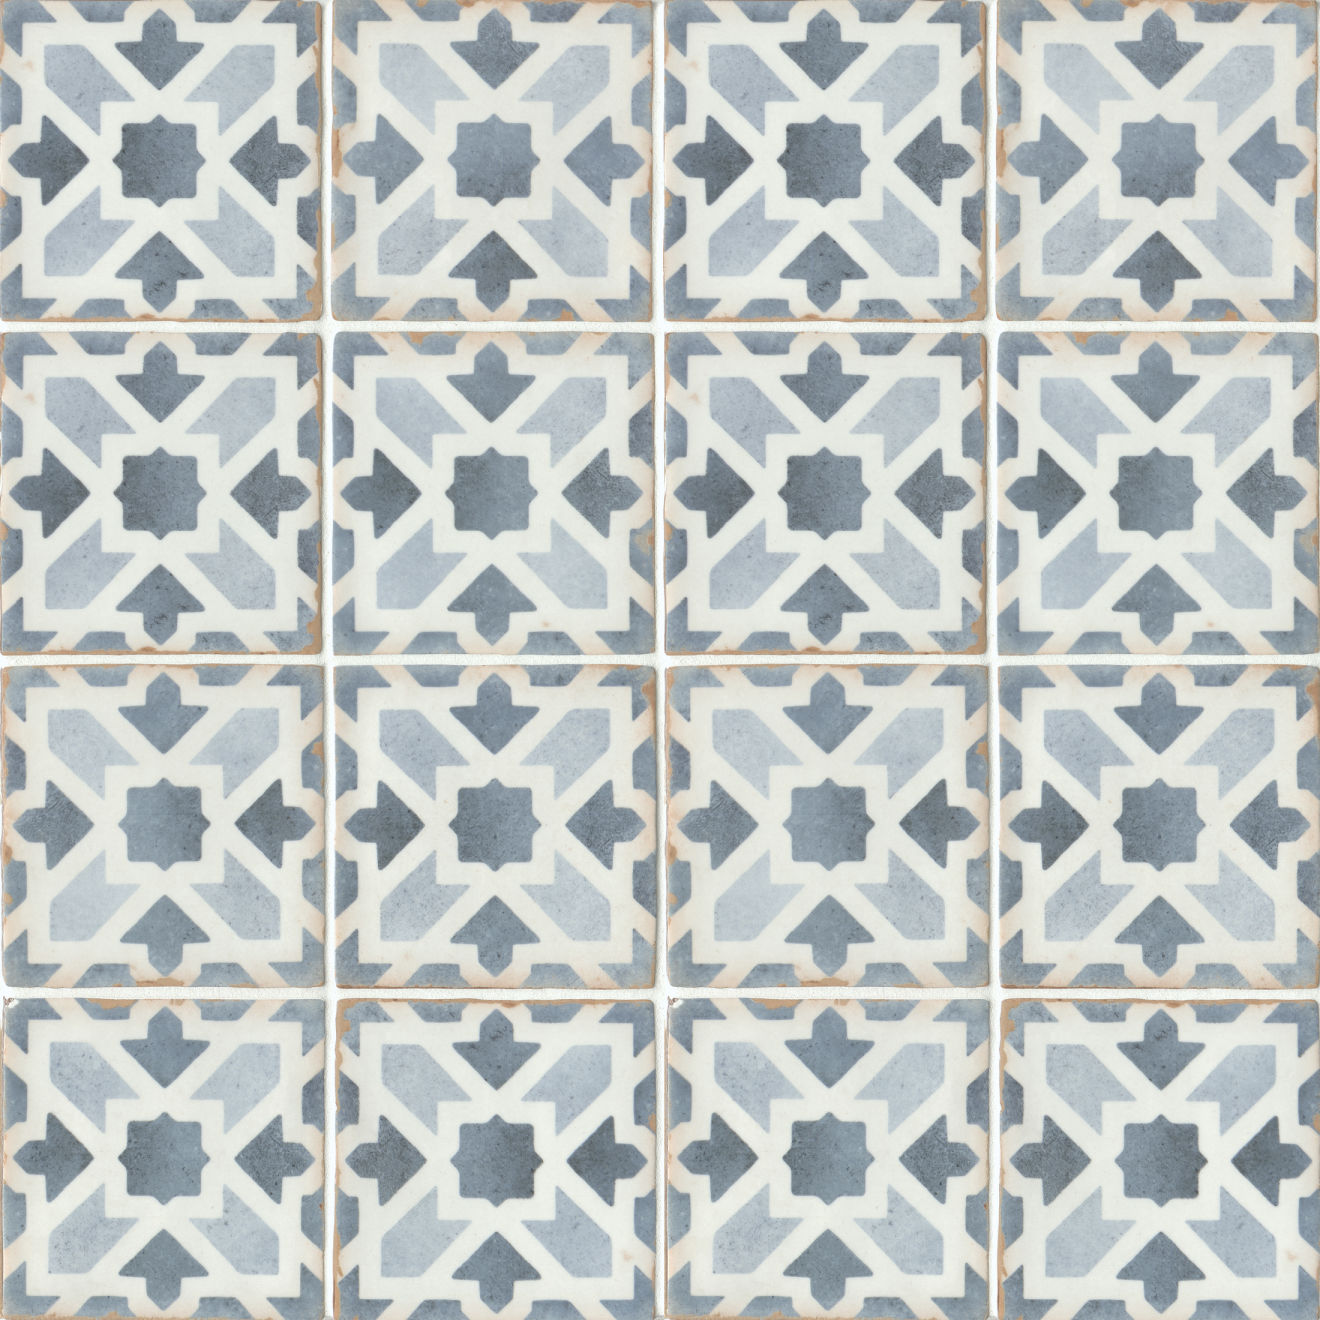 "Casablanca 5"" x 5"" Matte Ceramic Floor and Wall Tile in Gaza"